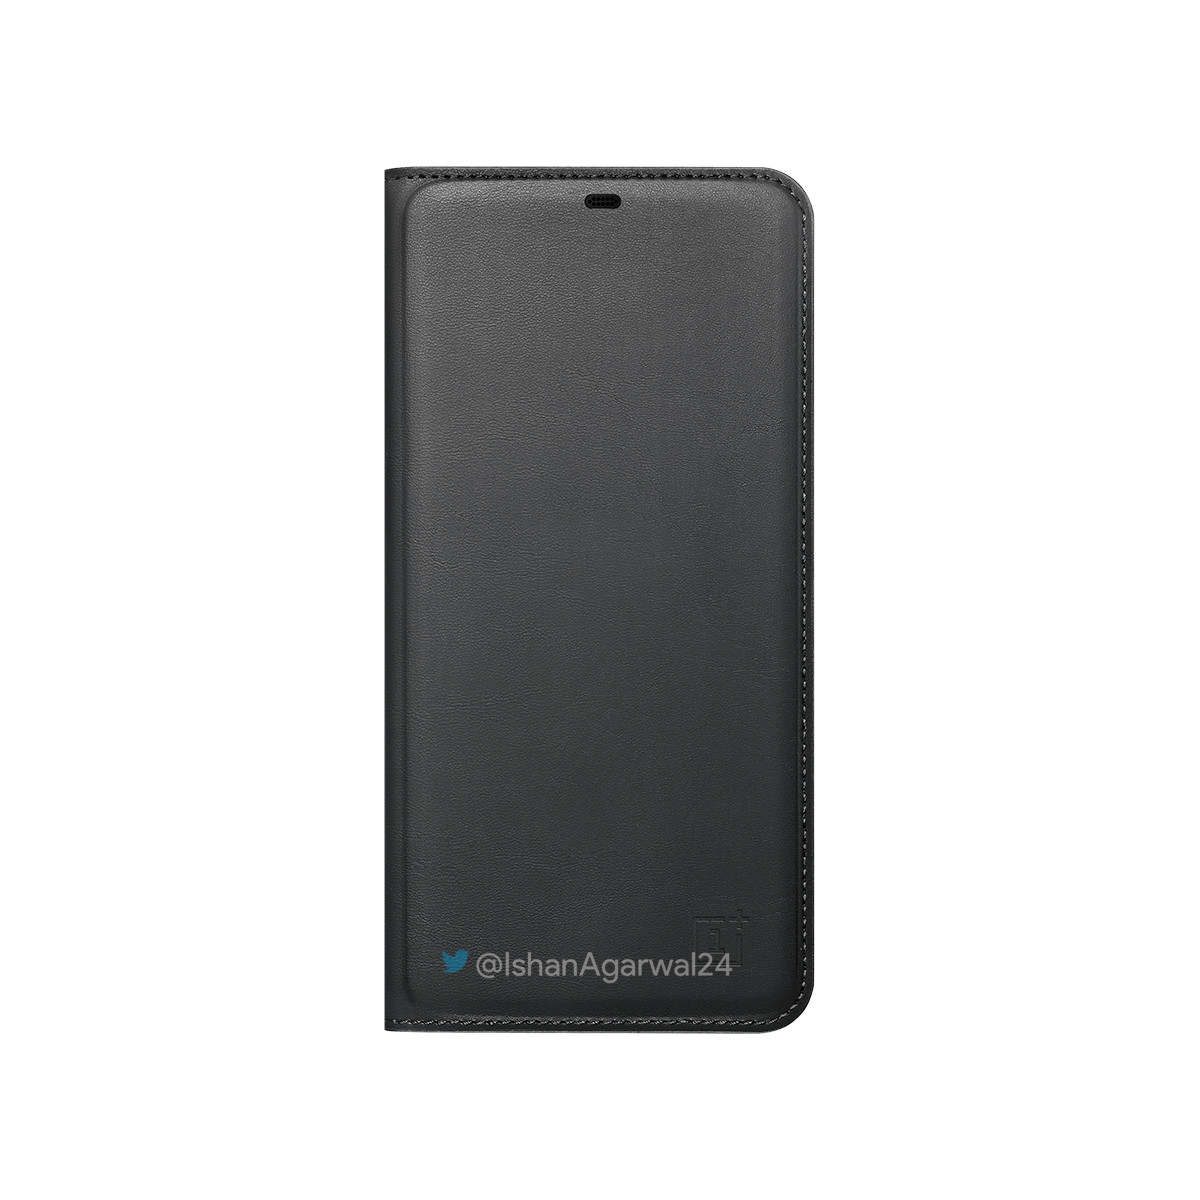 OnePlus 6 Accessories